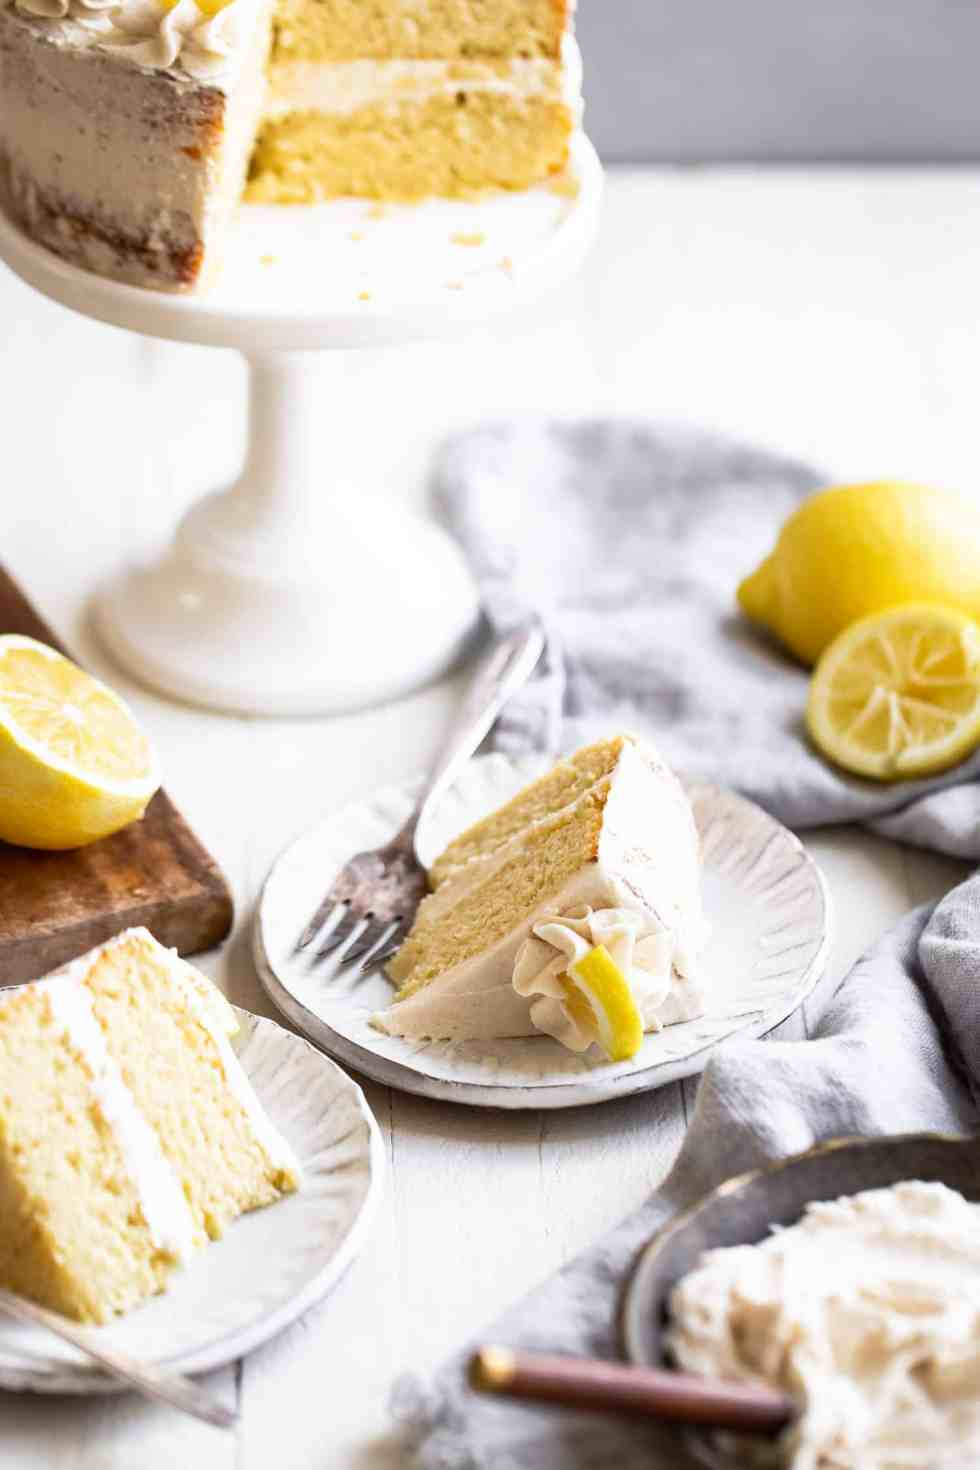 sugar free lemon cake on a plate with a fork